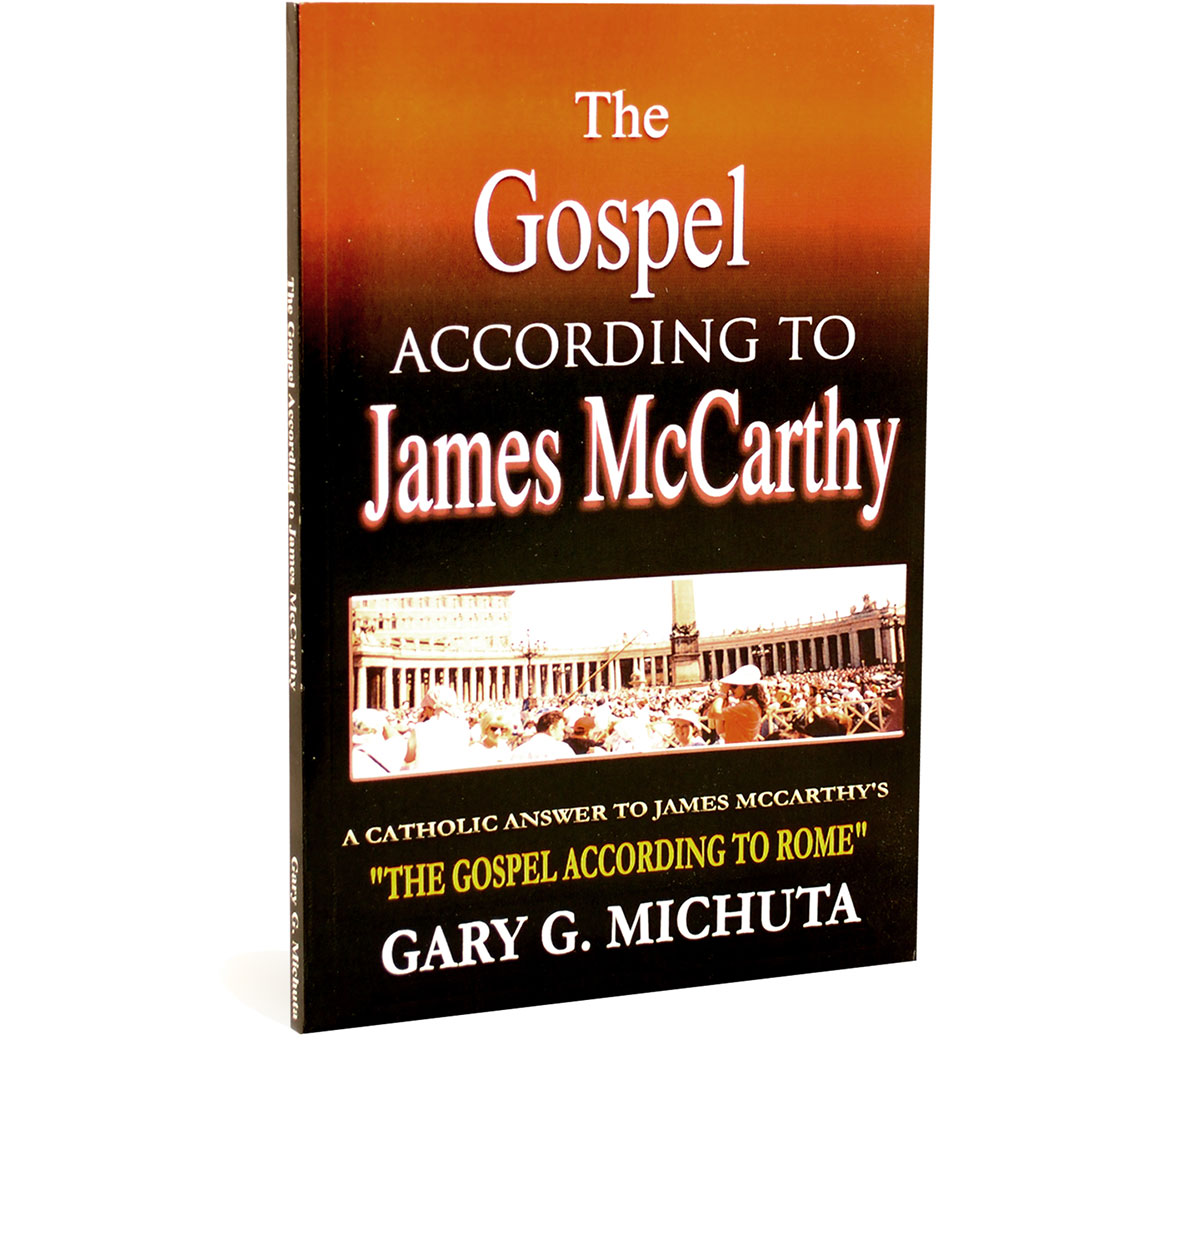 the-gospel-according-to-james-mccarthy-michuta.jpg